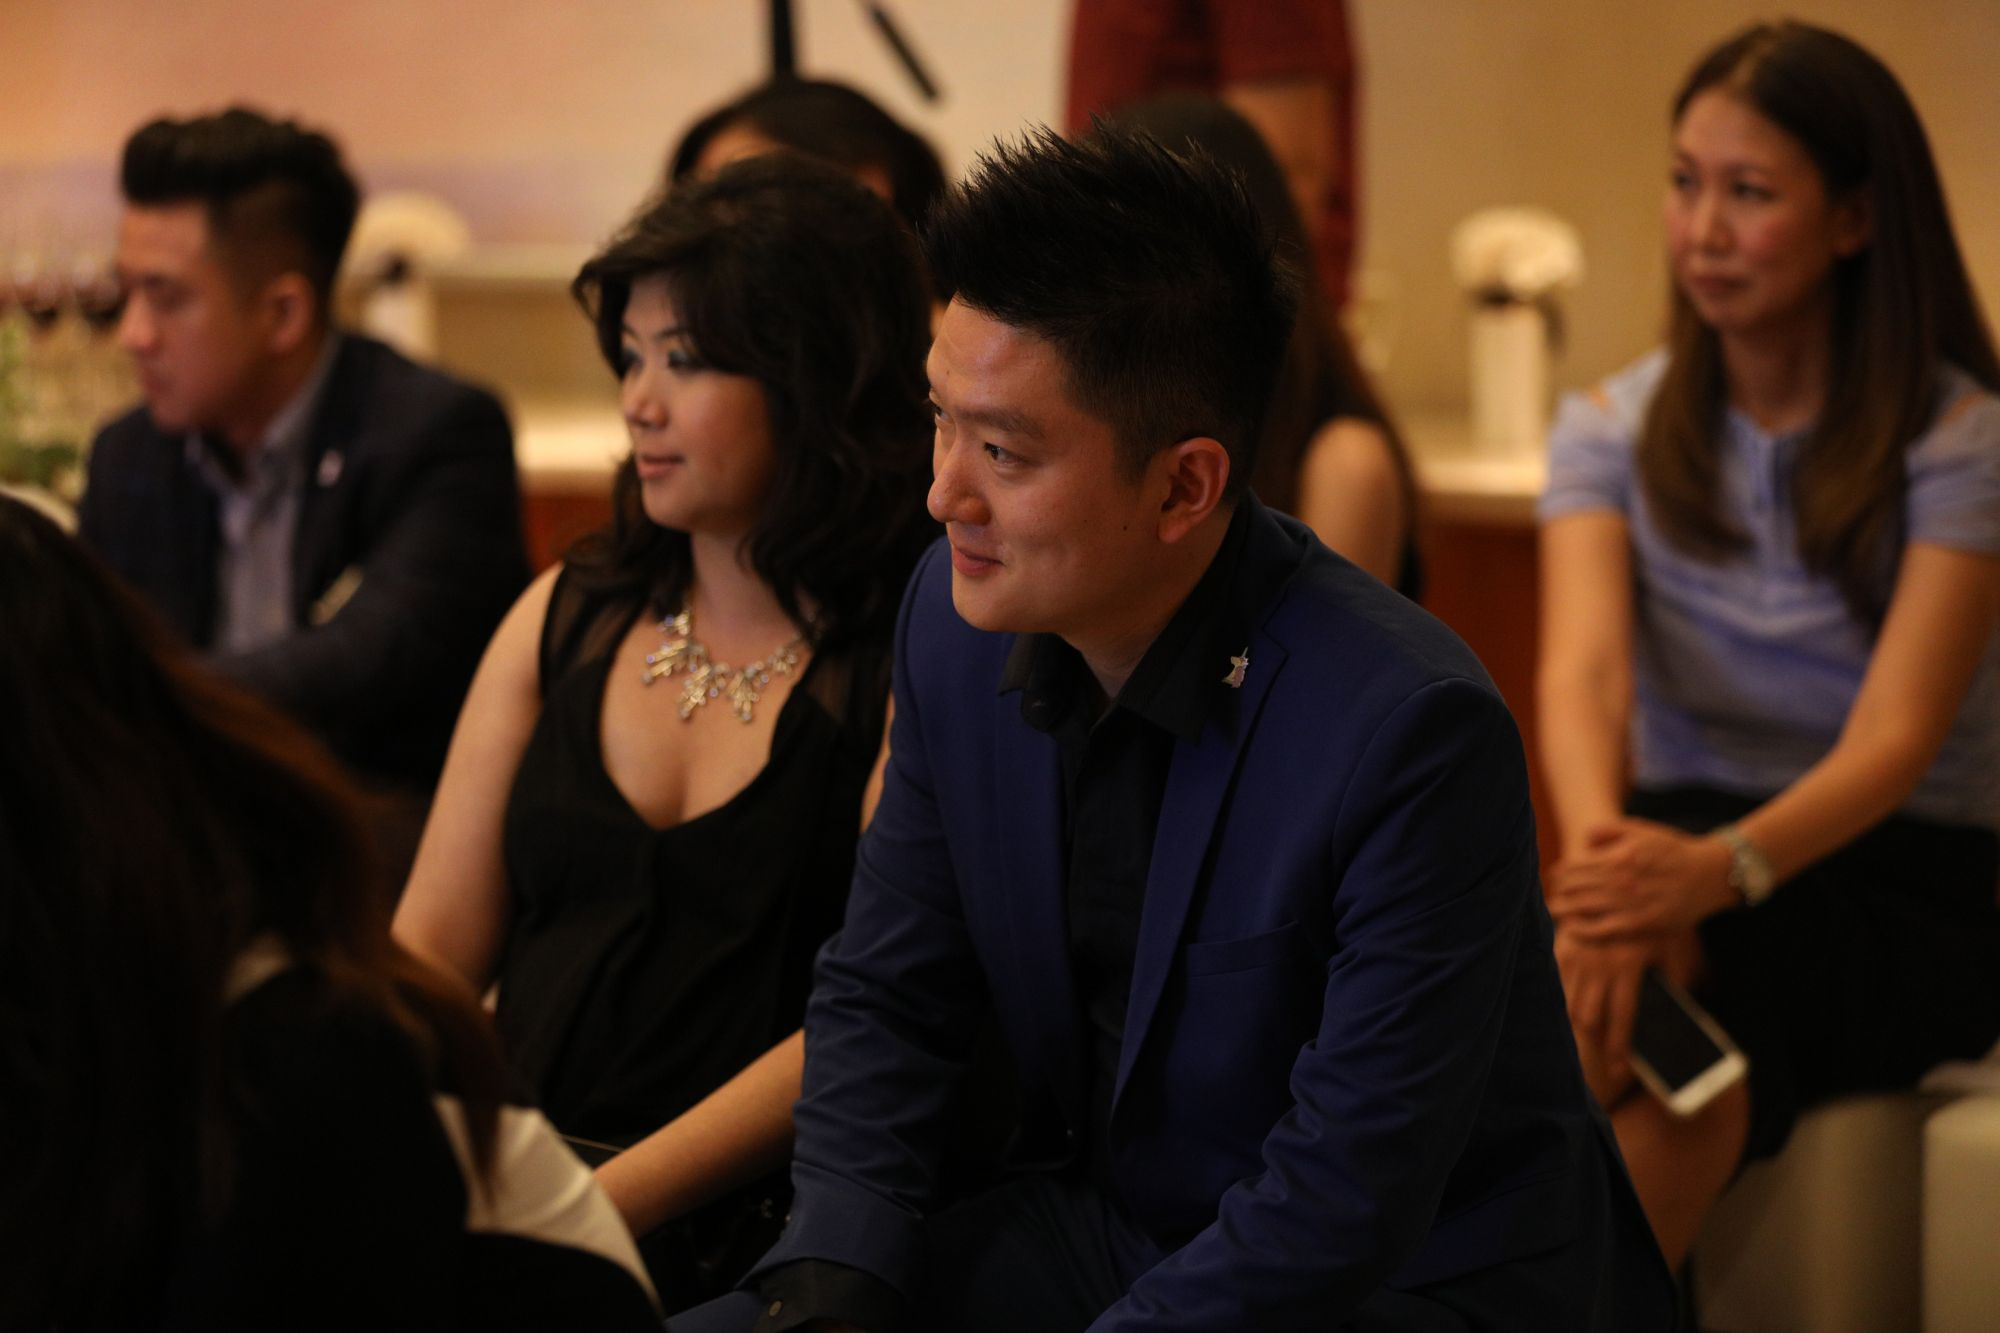 Guest, Tan Szue Hann